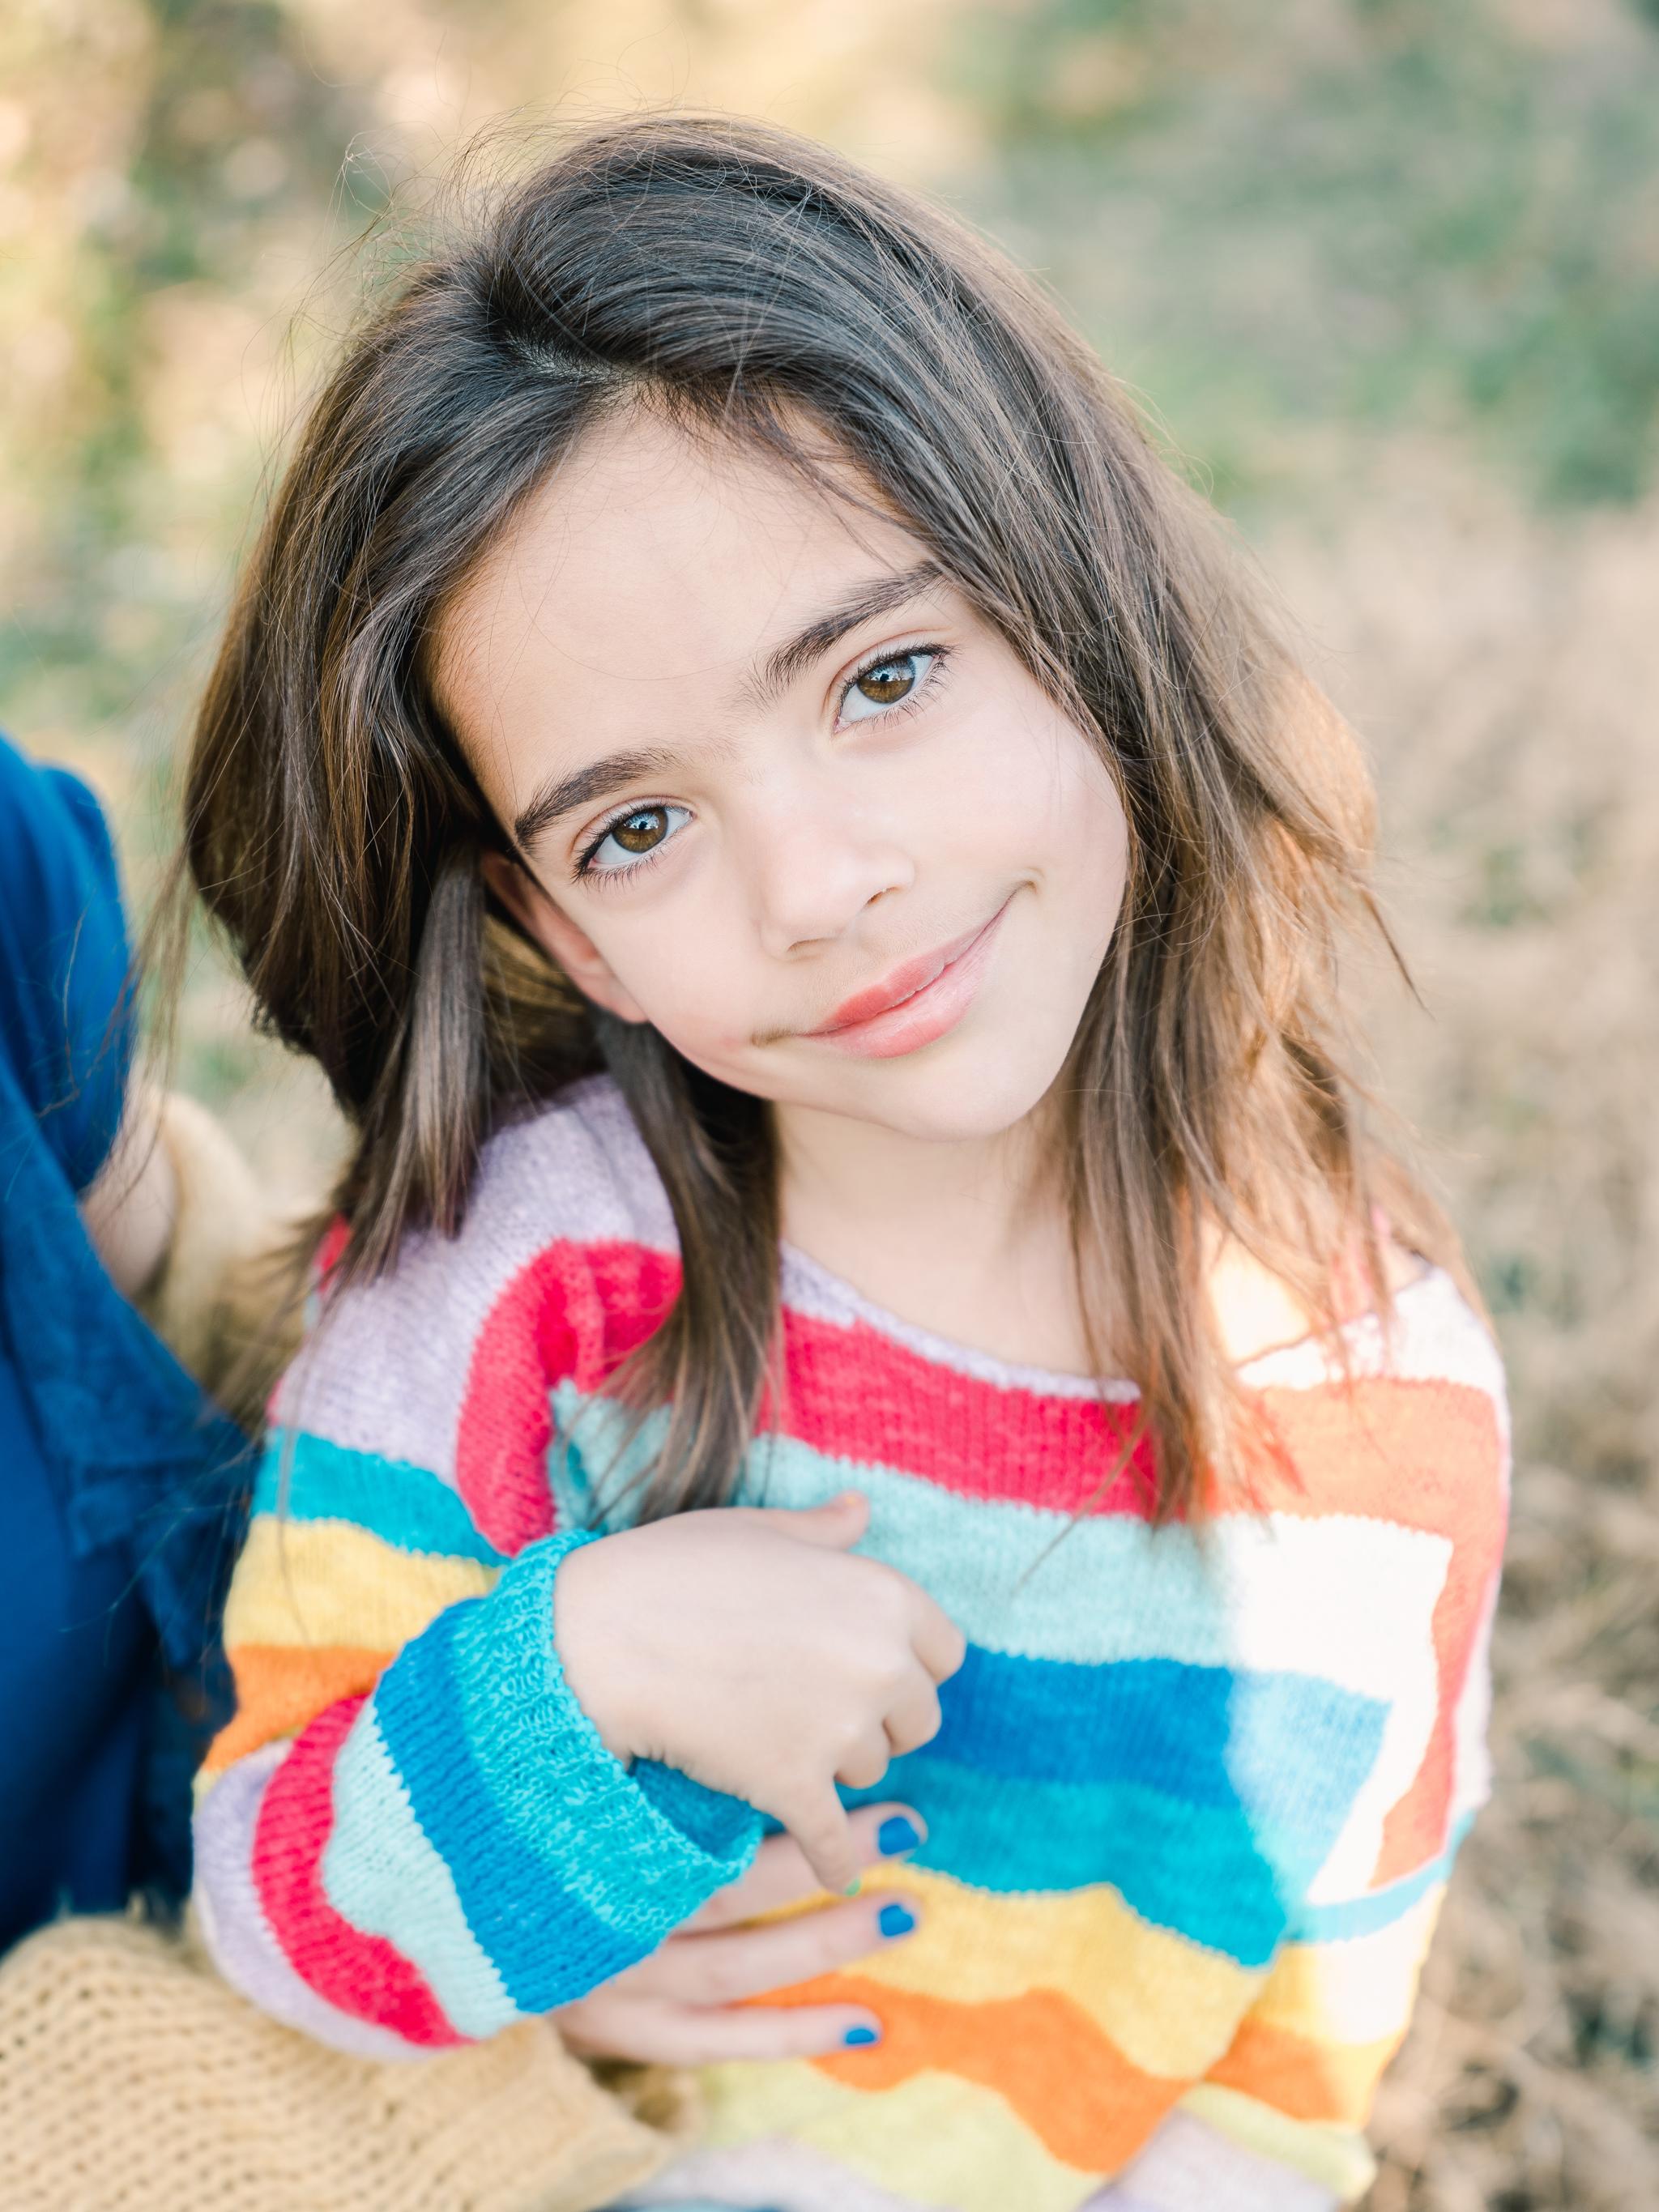 fotografia-infantil-familiar03.jpg